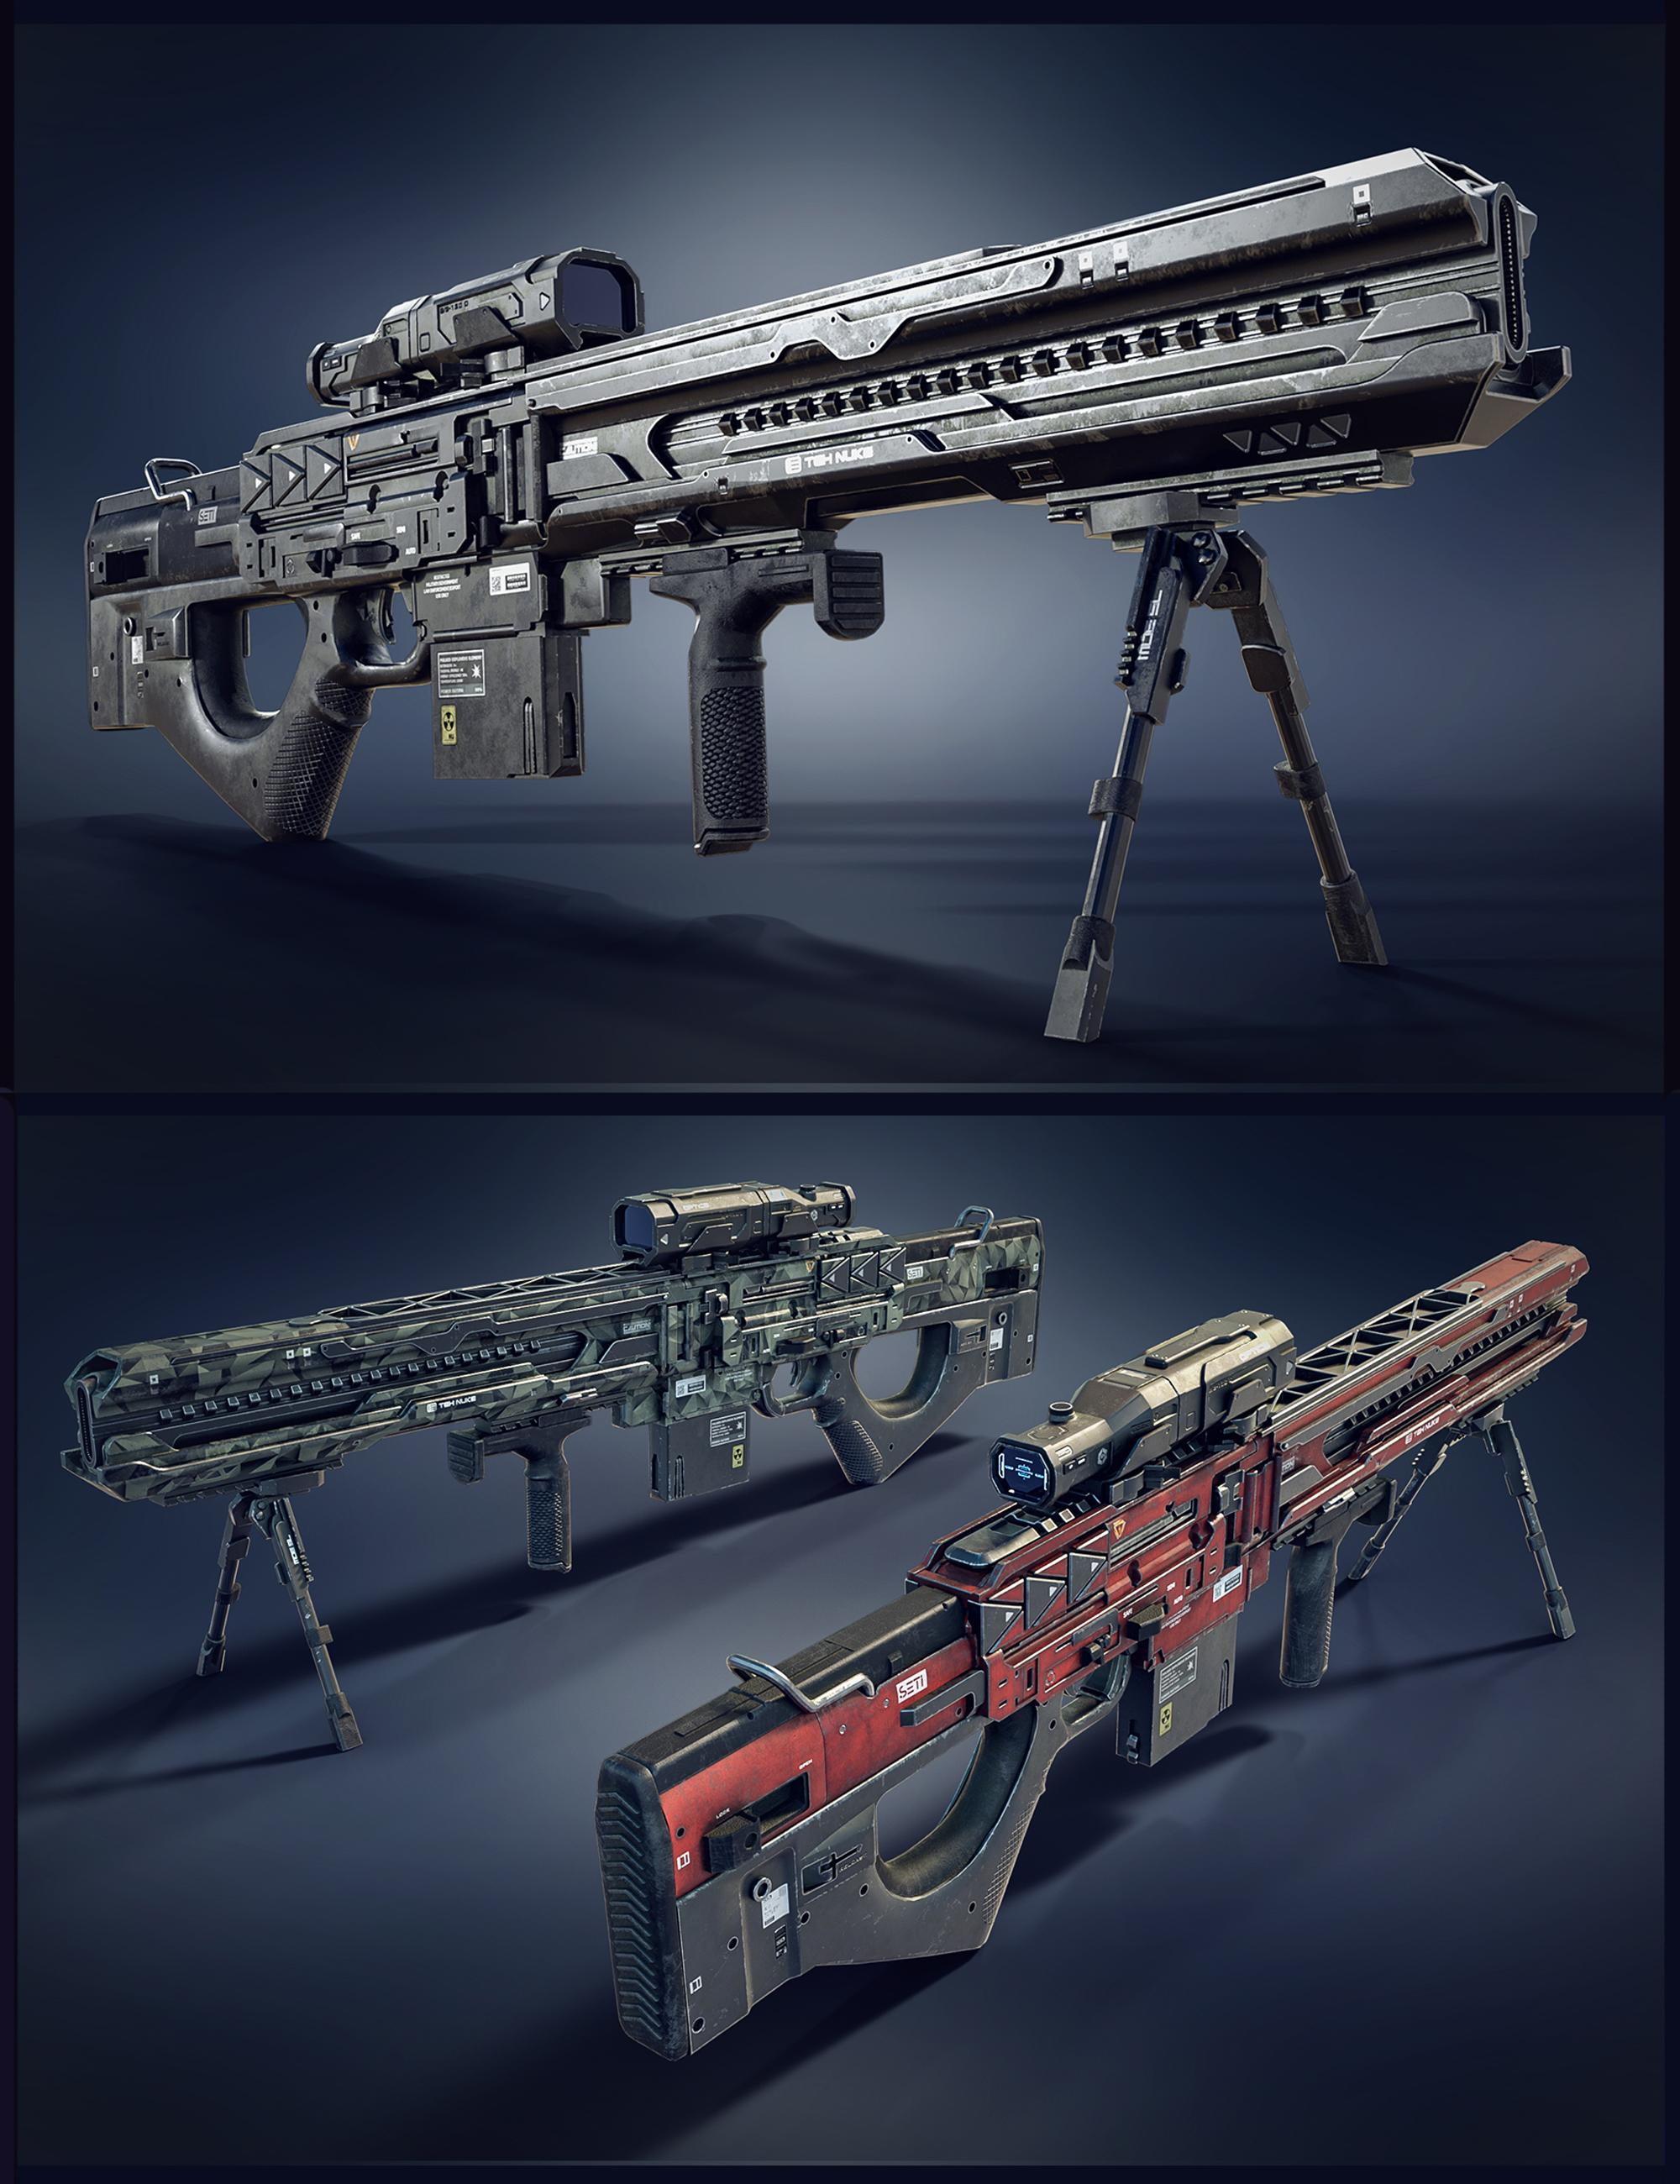 Cyberpunk Droid Sniper Rifle by: Polish, 3D Models by Daz 3D